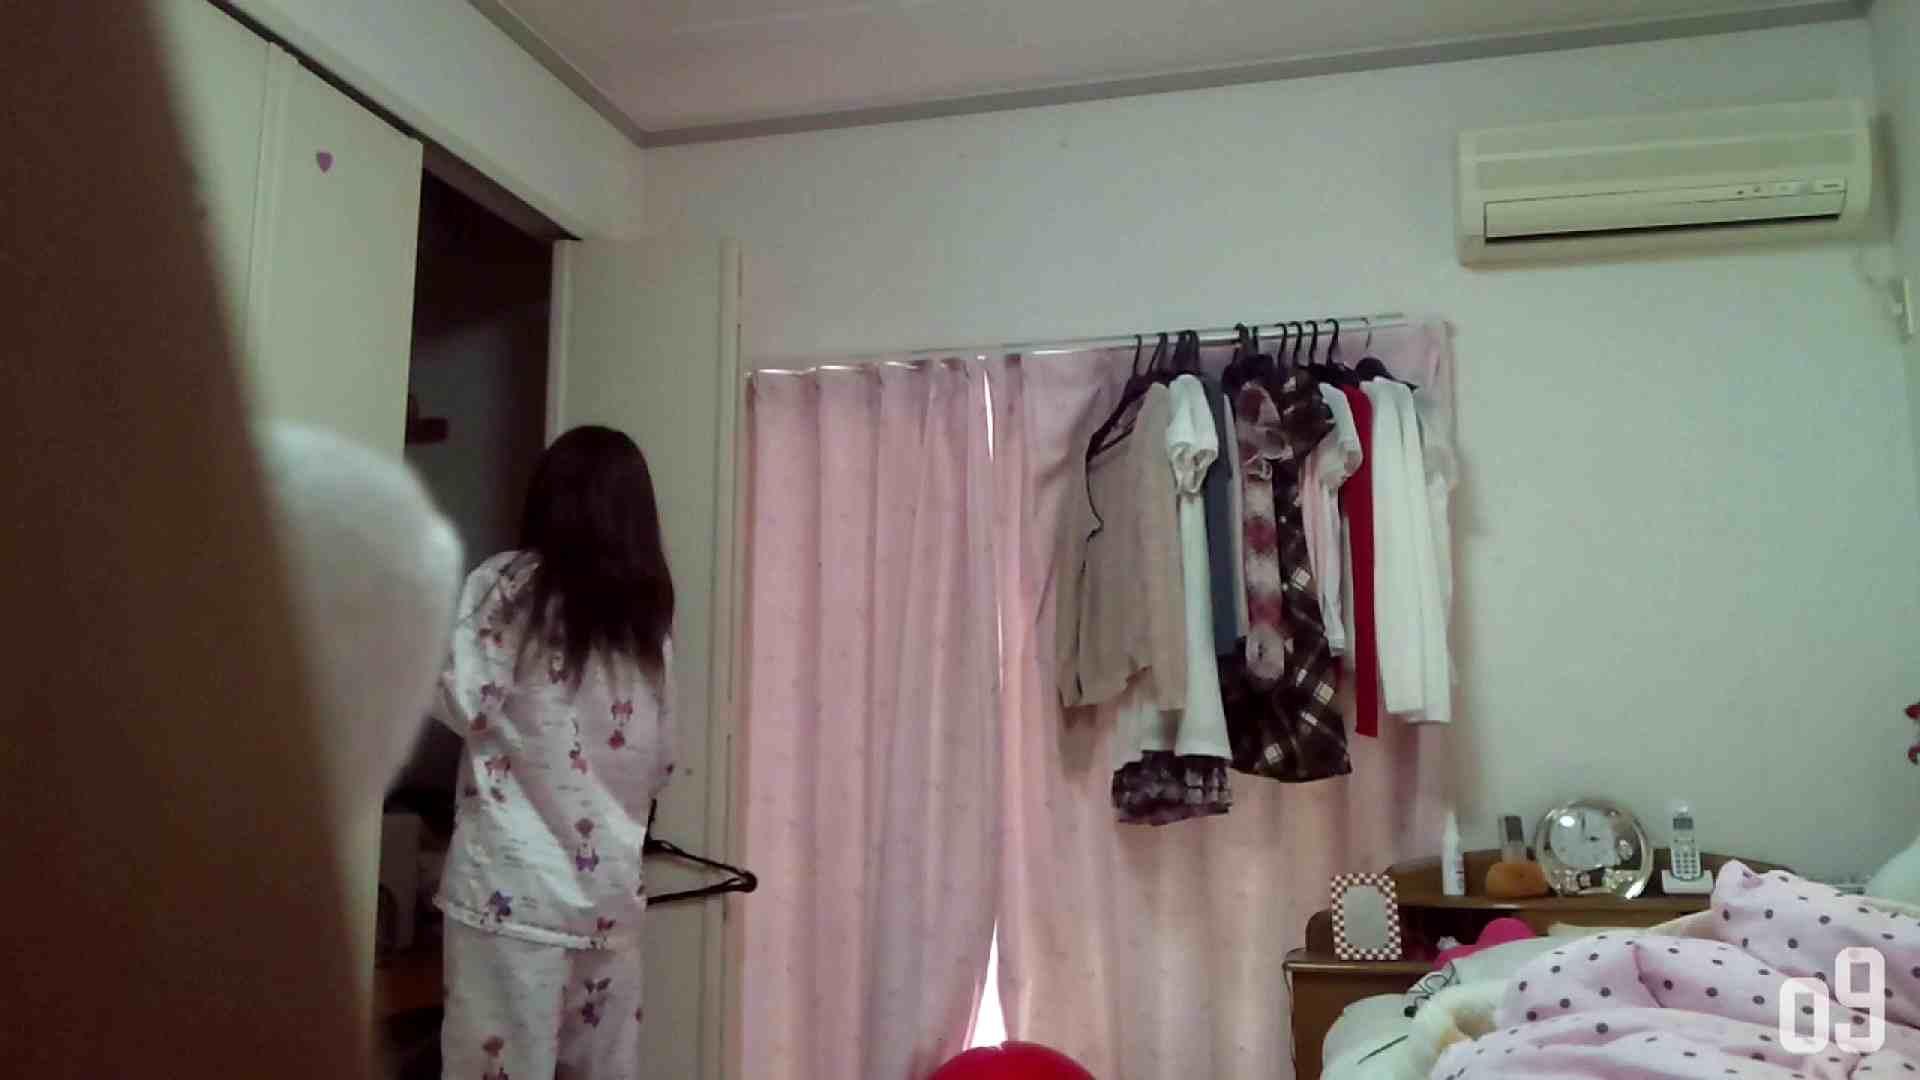 vol.2 瑞希ちゃんの自宅公開!寝起きの着替え・・・ラリルそー 着替え  77pic 15